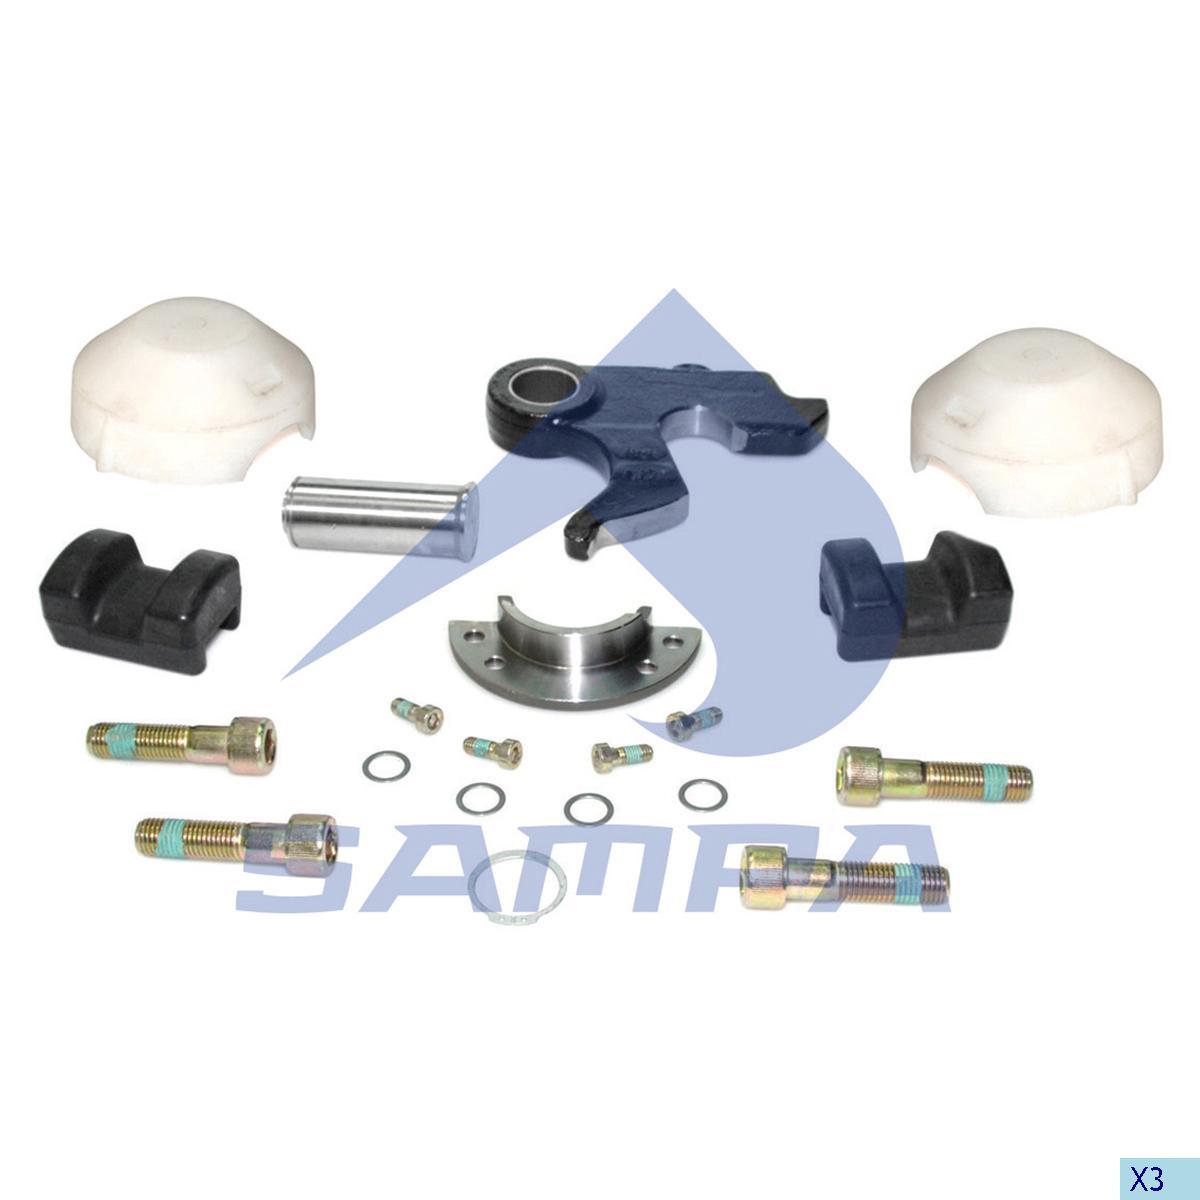 Repair Kit, Fifth Wheel, Complementary Equipment